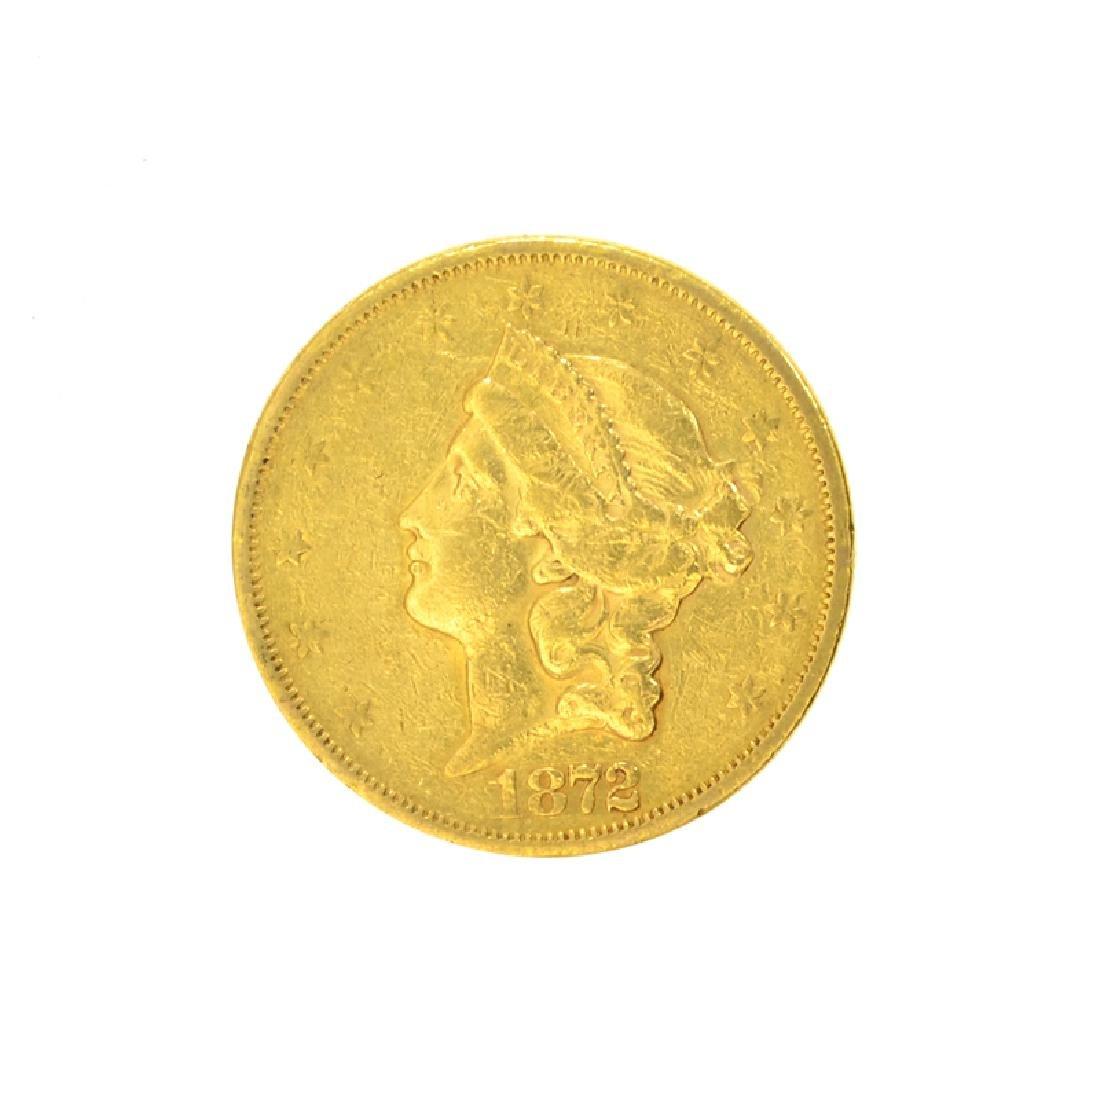 *1872-S $20 U.S. Liberty Head Gold Coin (DF)